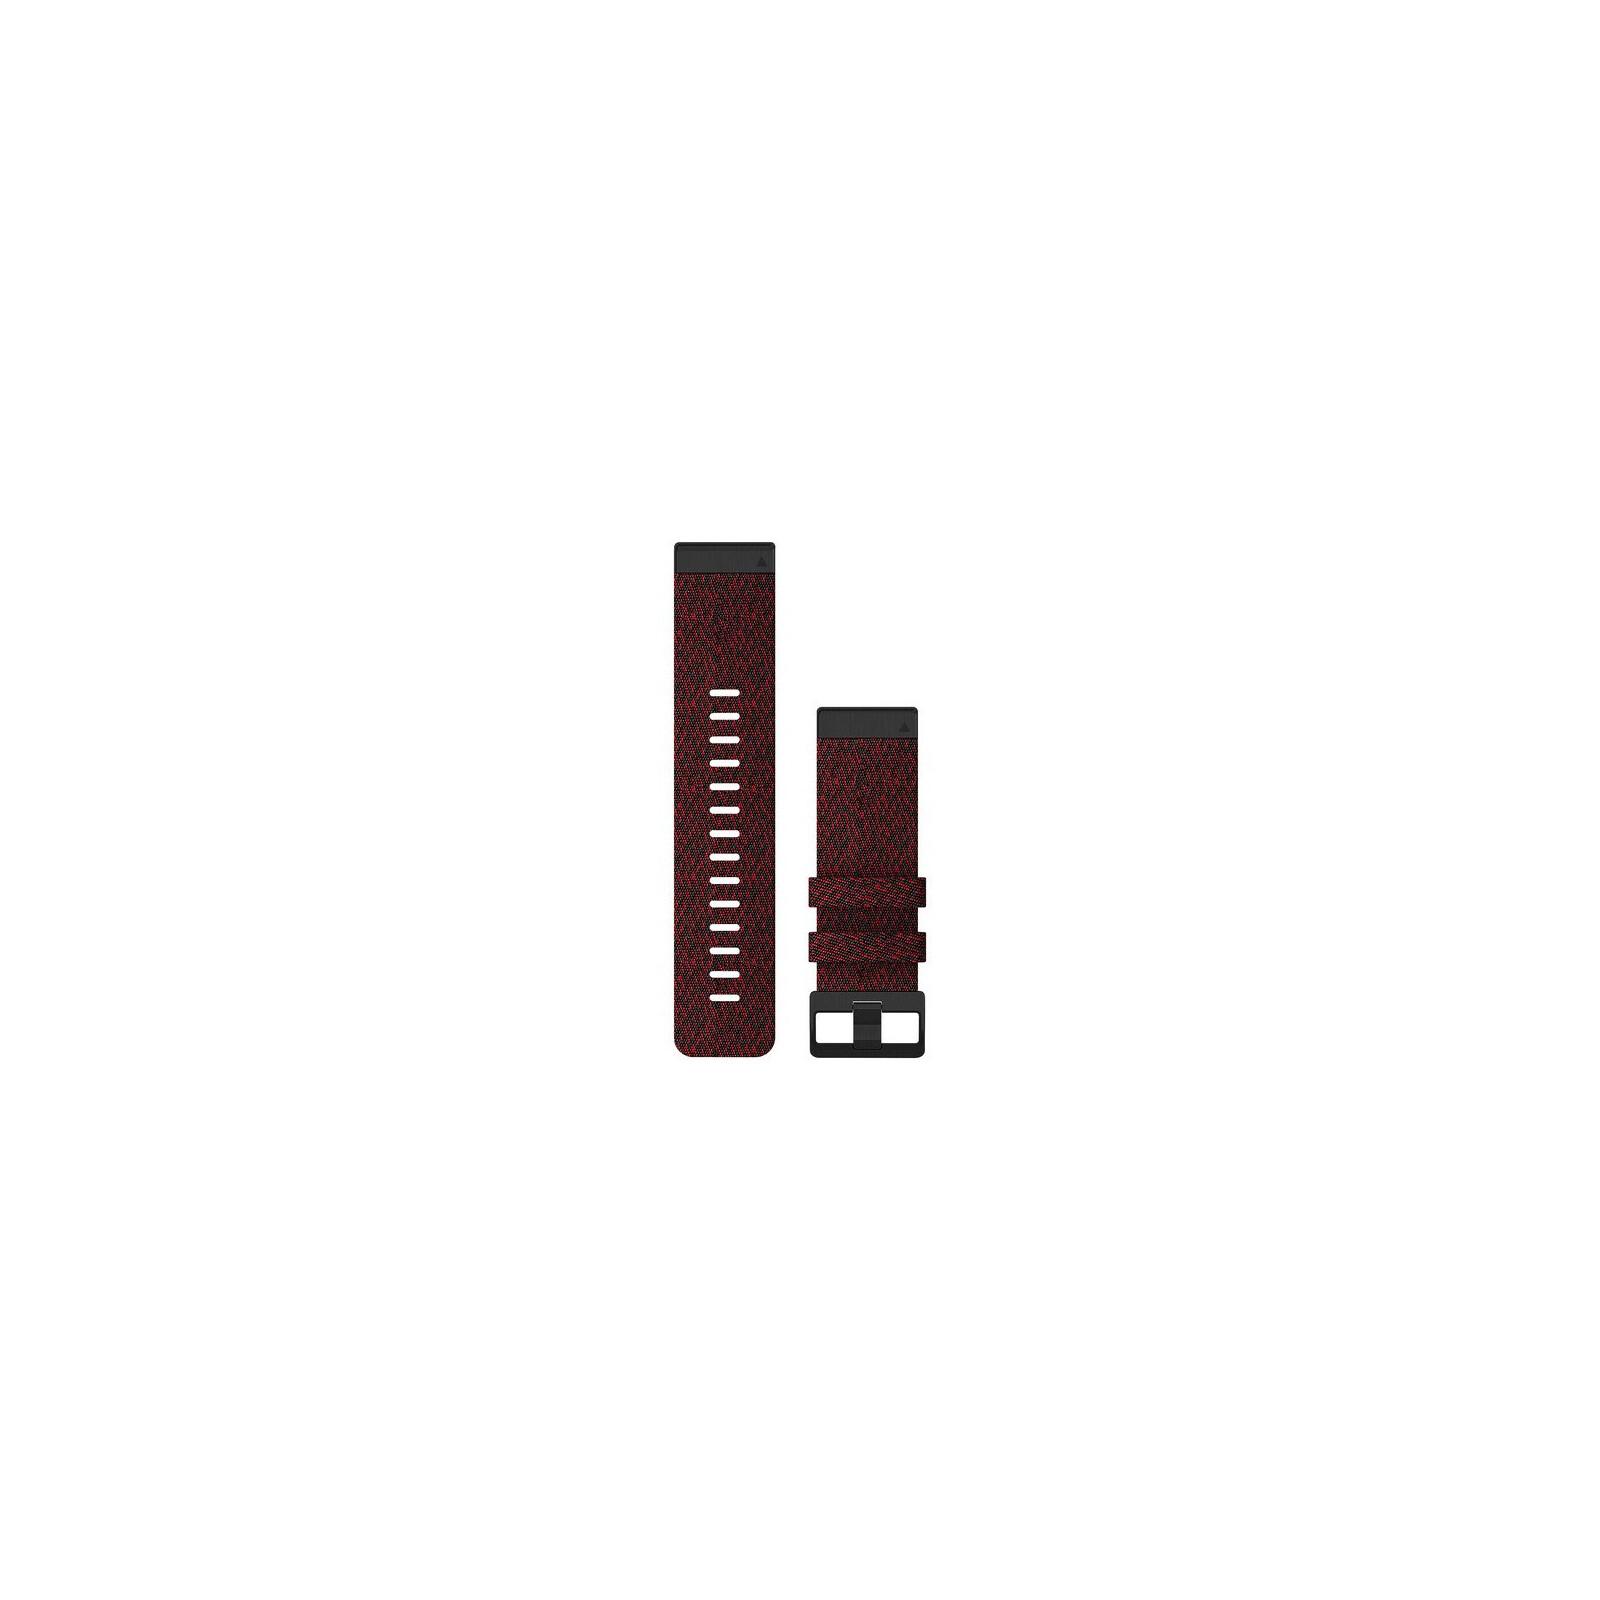 Garmin Quickfit Band 26mm Nylon rot meliert schwarz